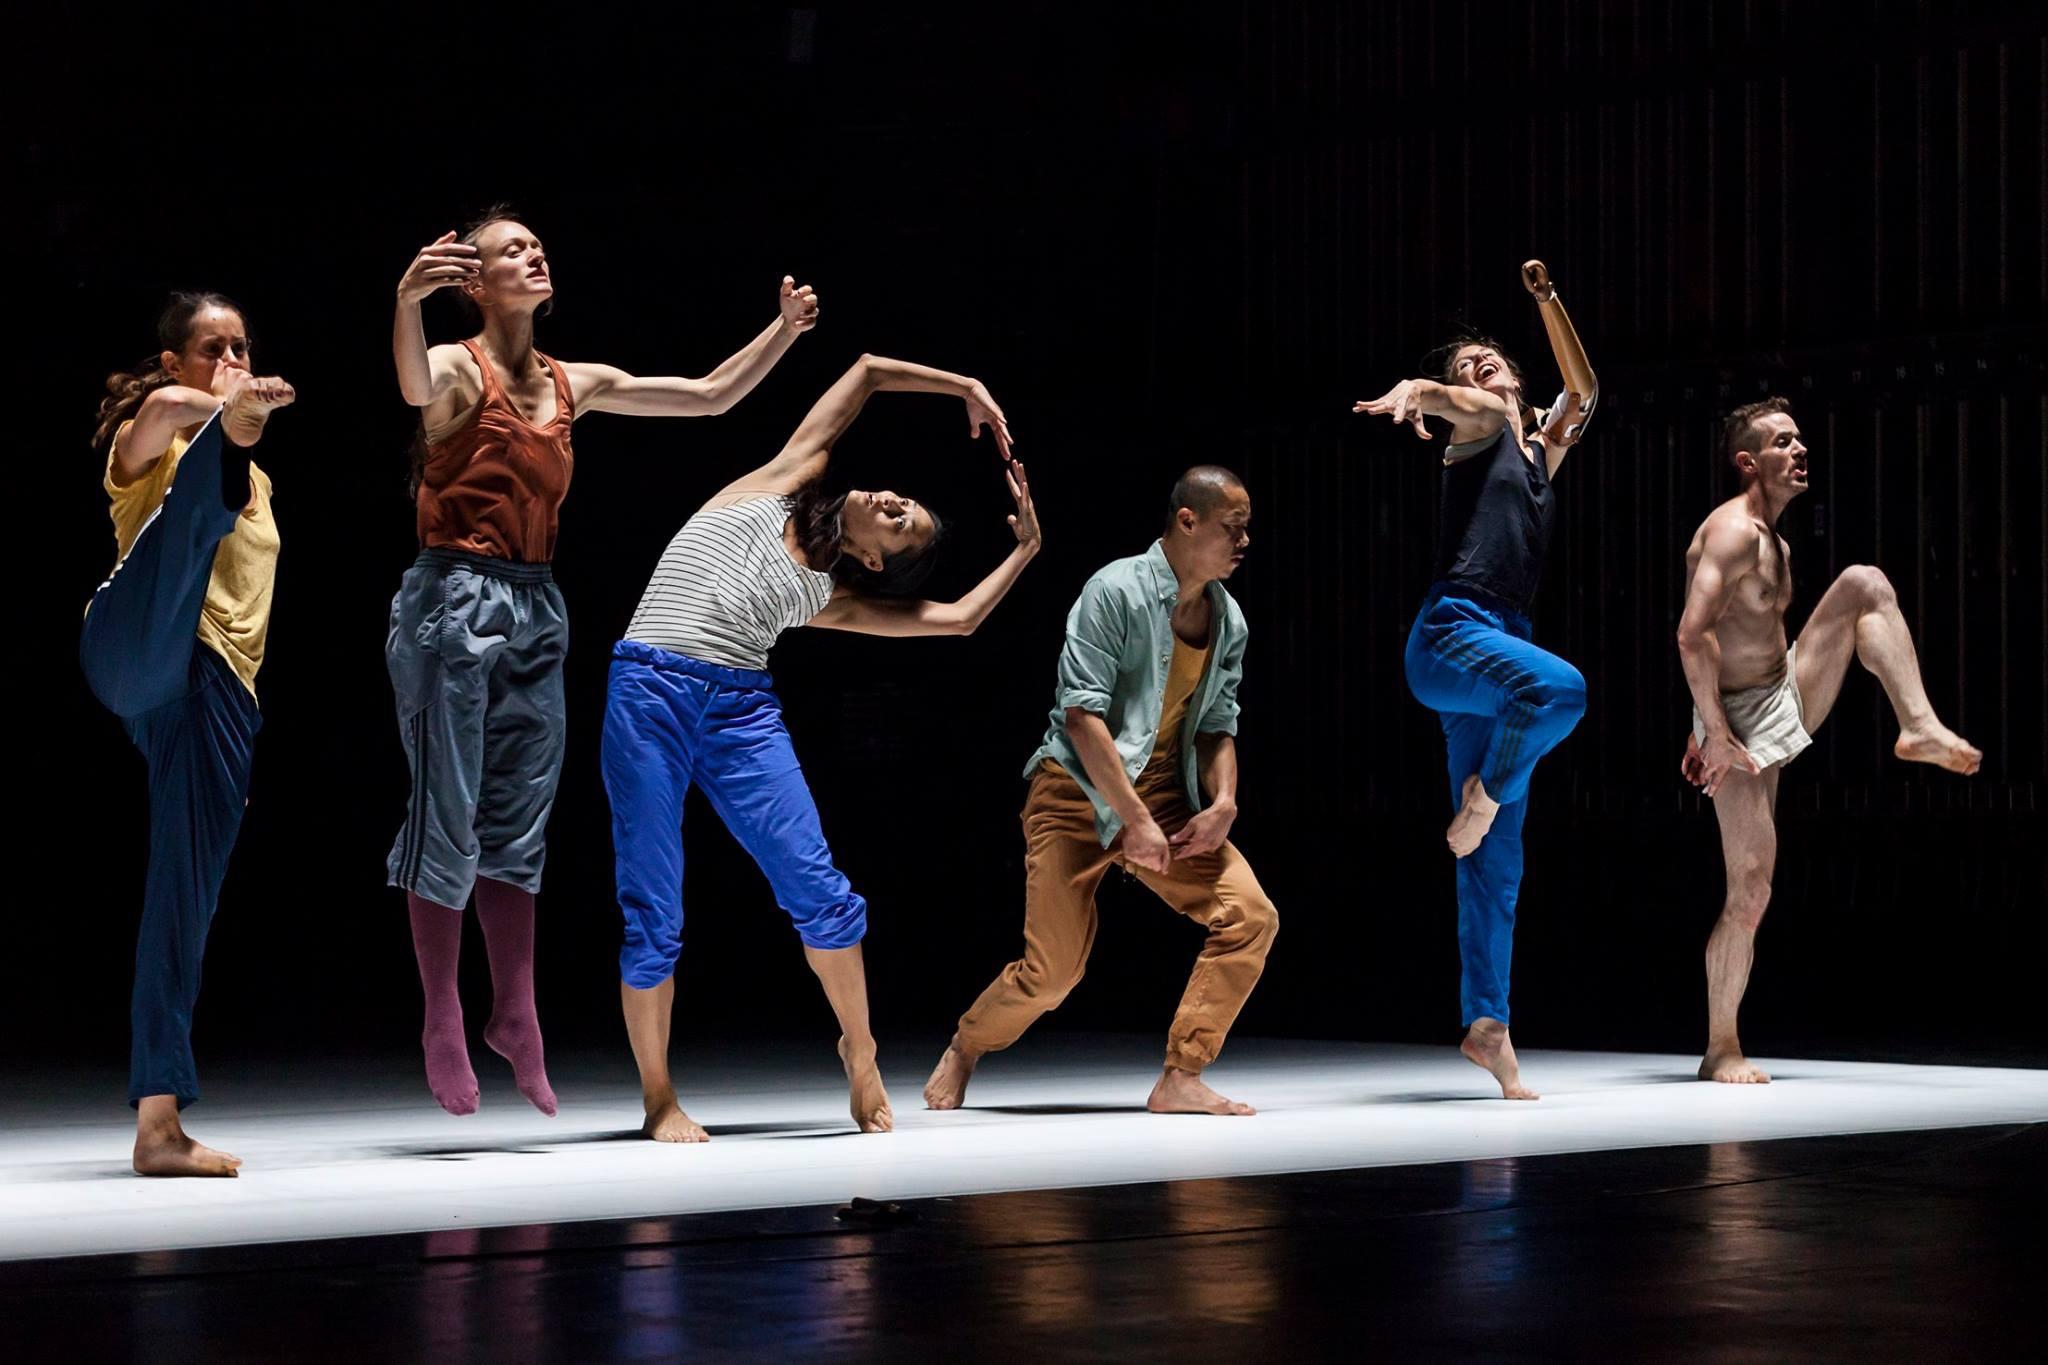 Emanuel Gat Dance